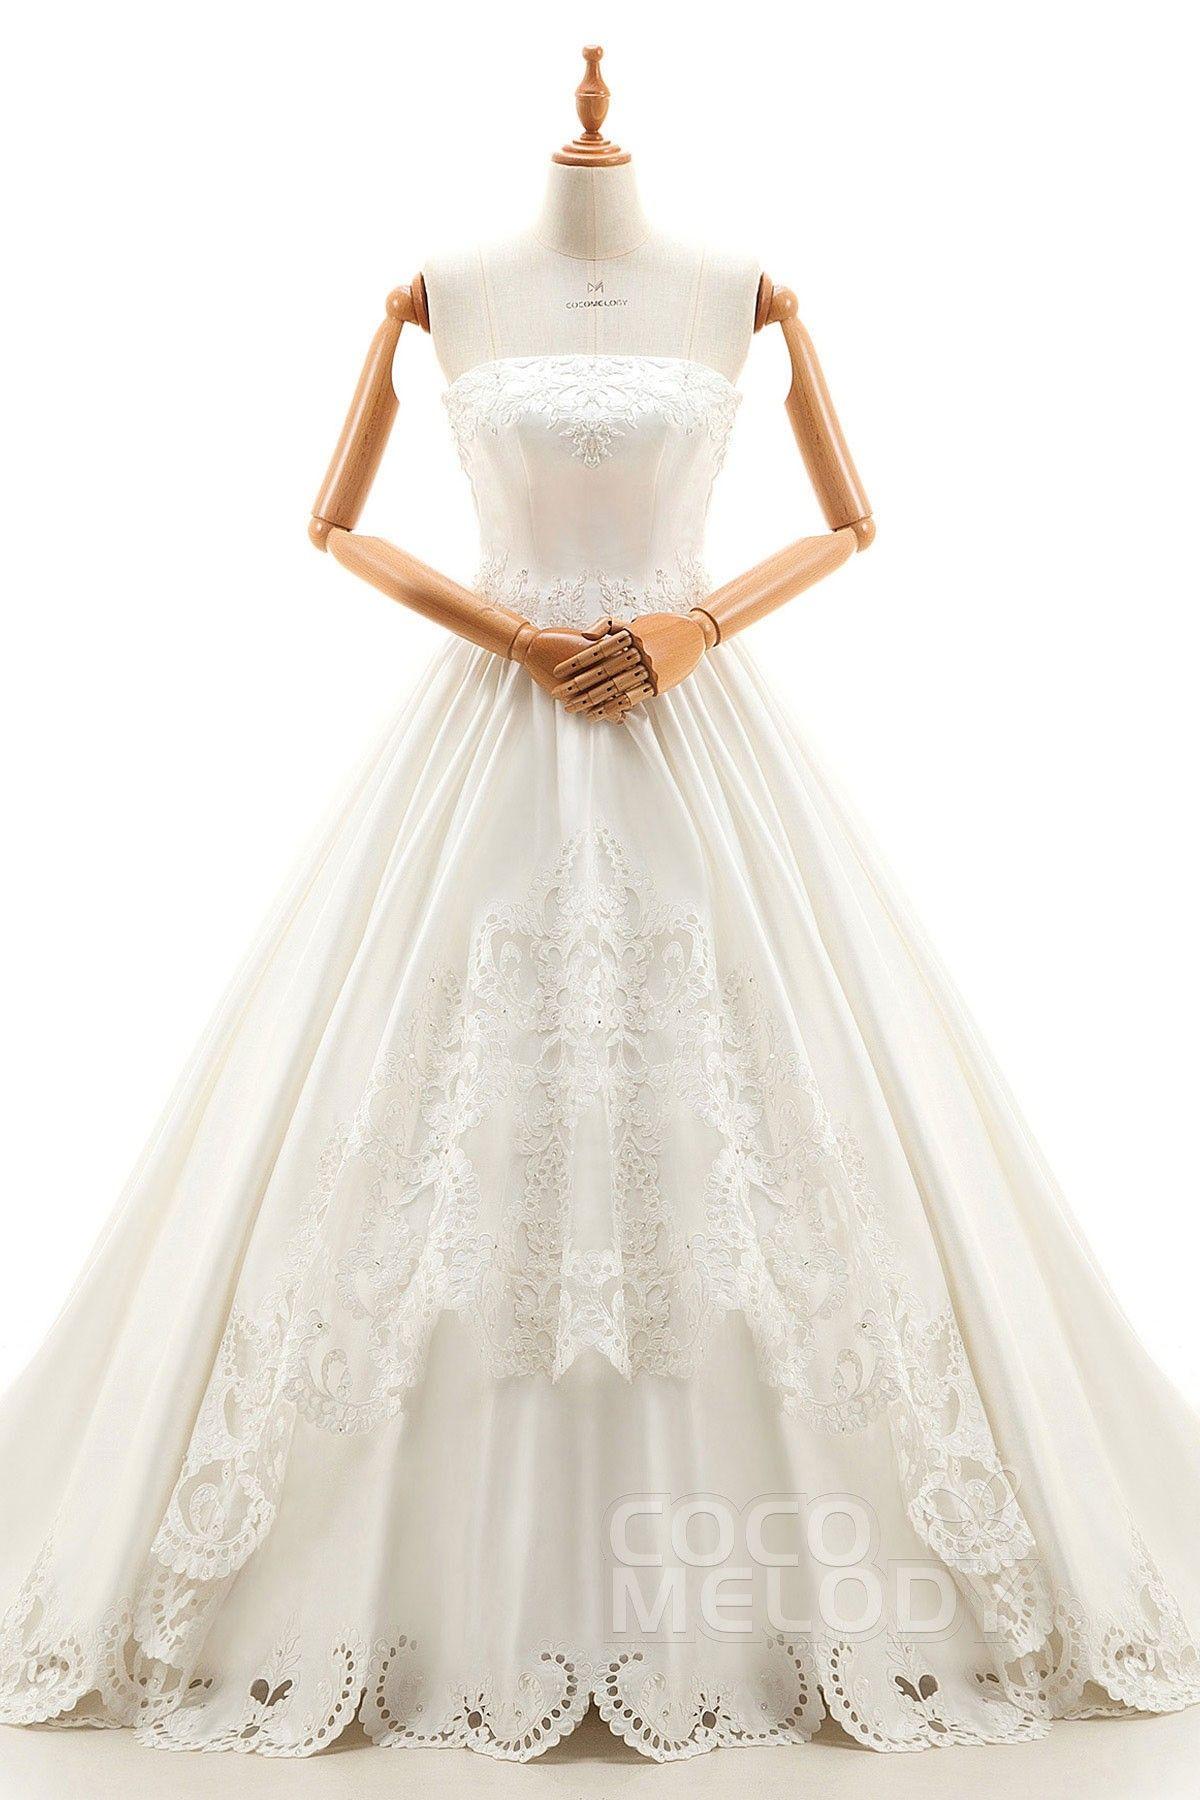 ALine Cathedral Train Satin Wedding Dress B14TB0083 in